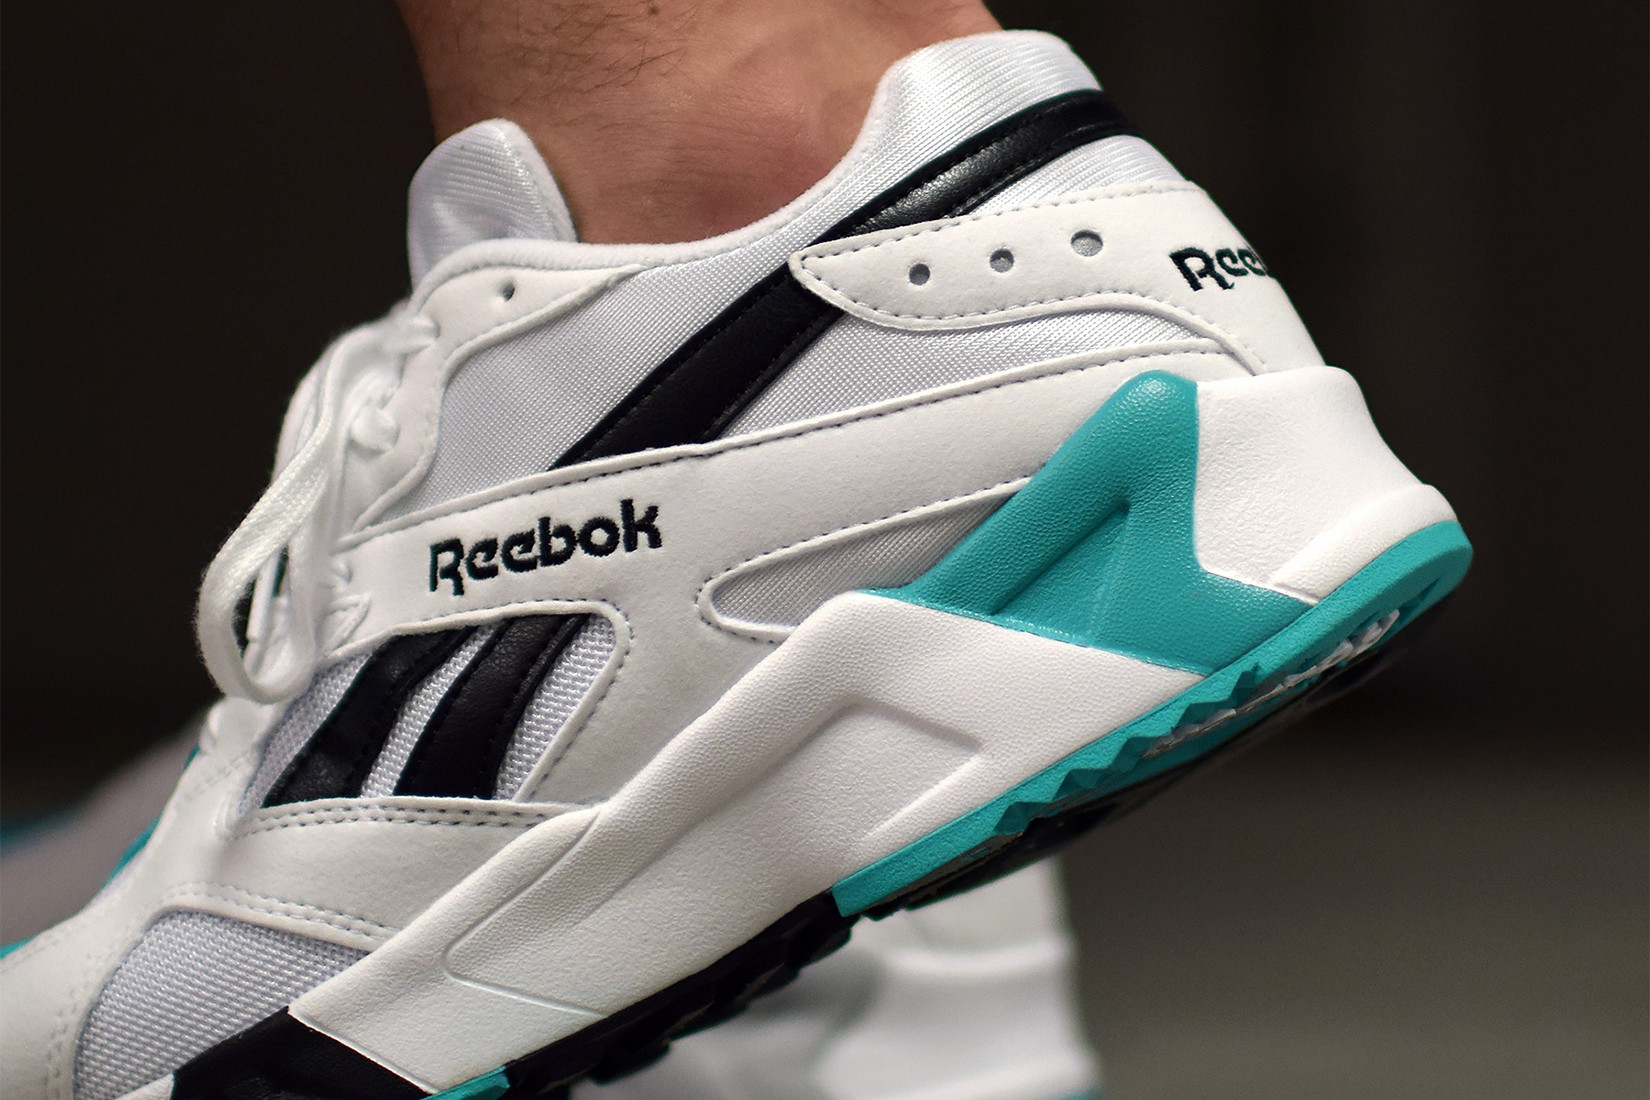 Reebok Aztrek OG 2018 Sneaker Release